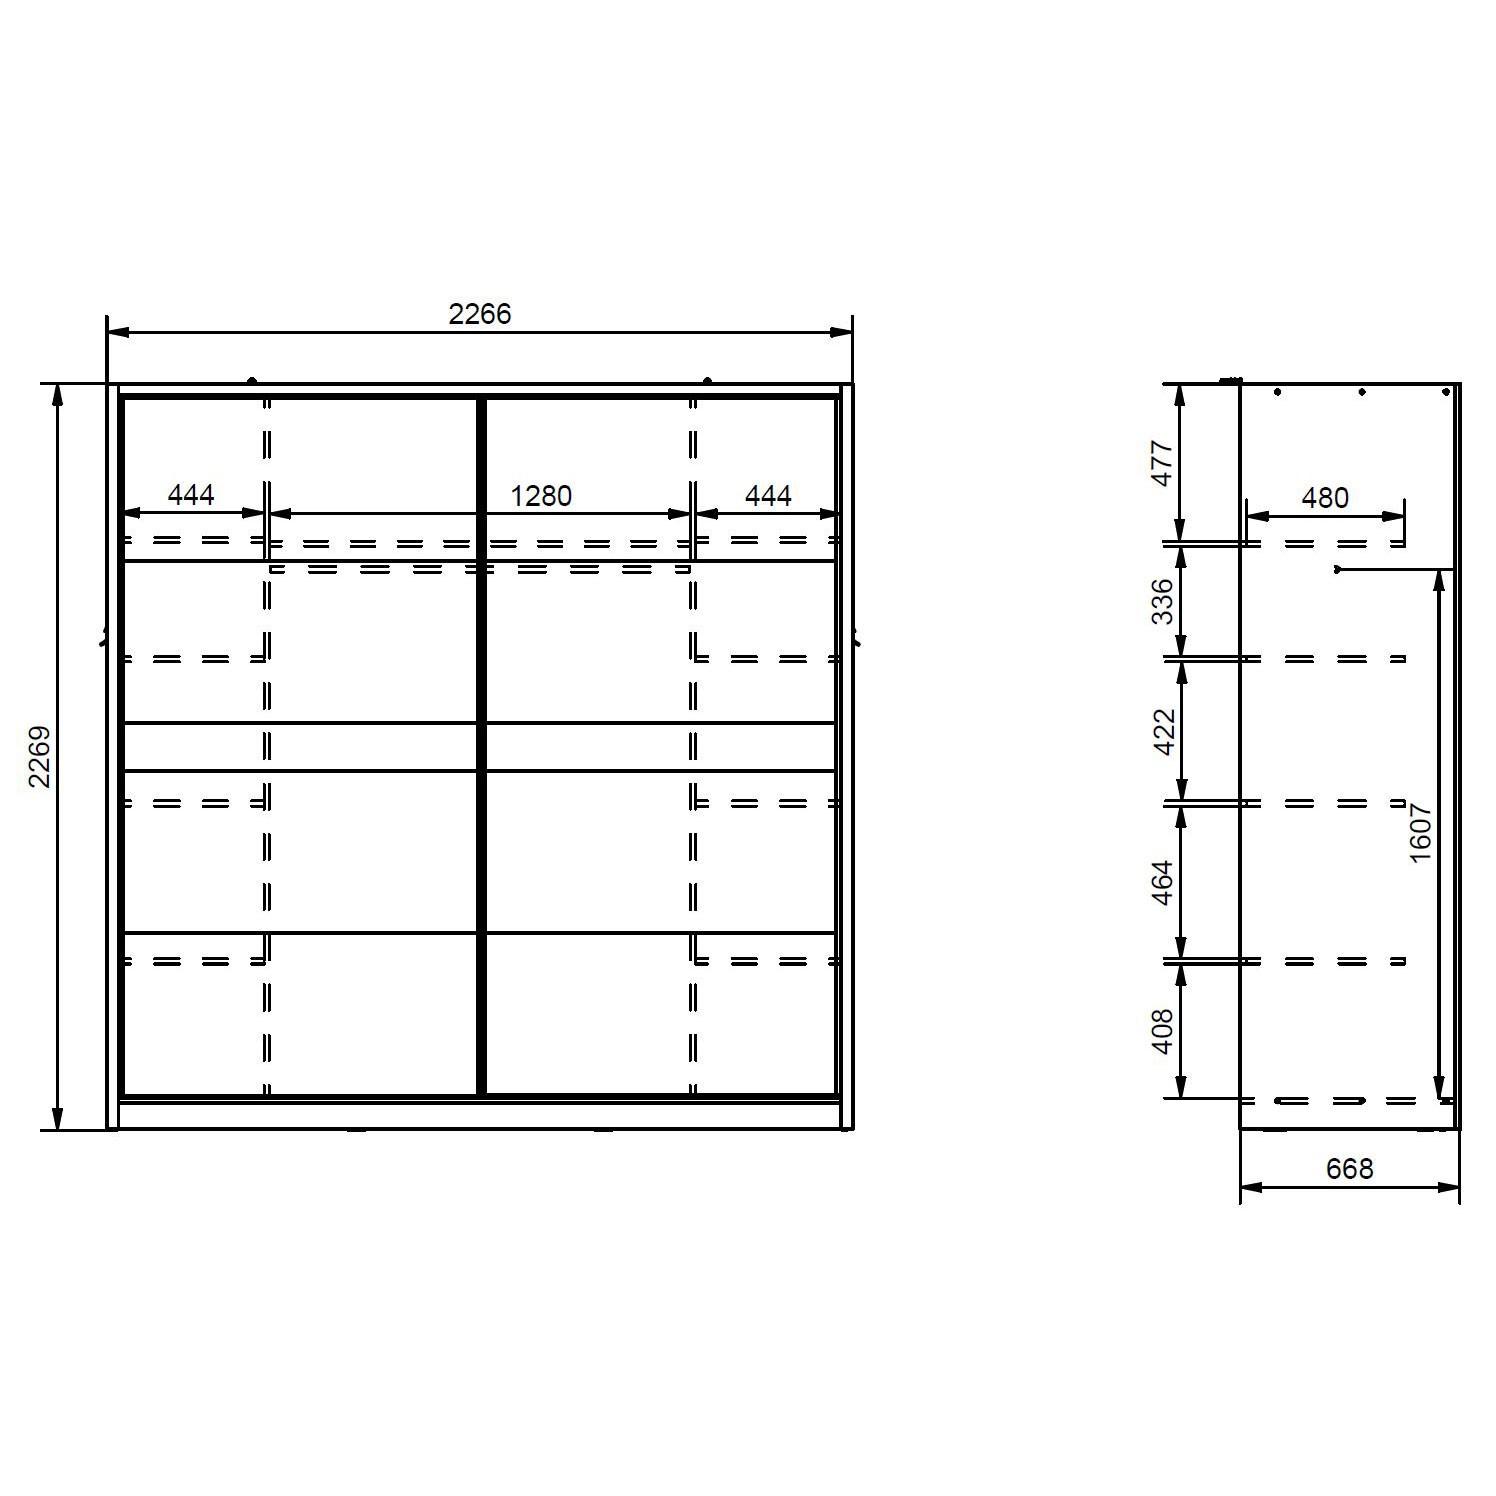 Dulap dormitor Pictor, stejar auriu + alb, 2 usi, 226.5 x 67 x 227 cm, 5C